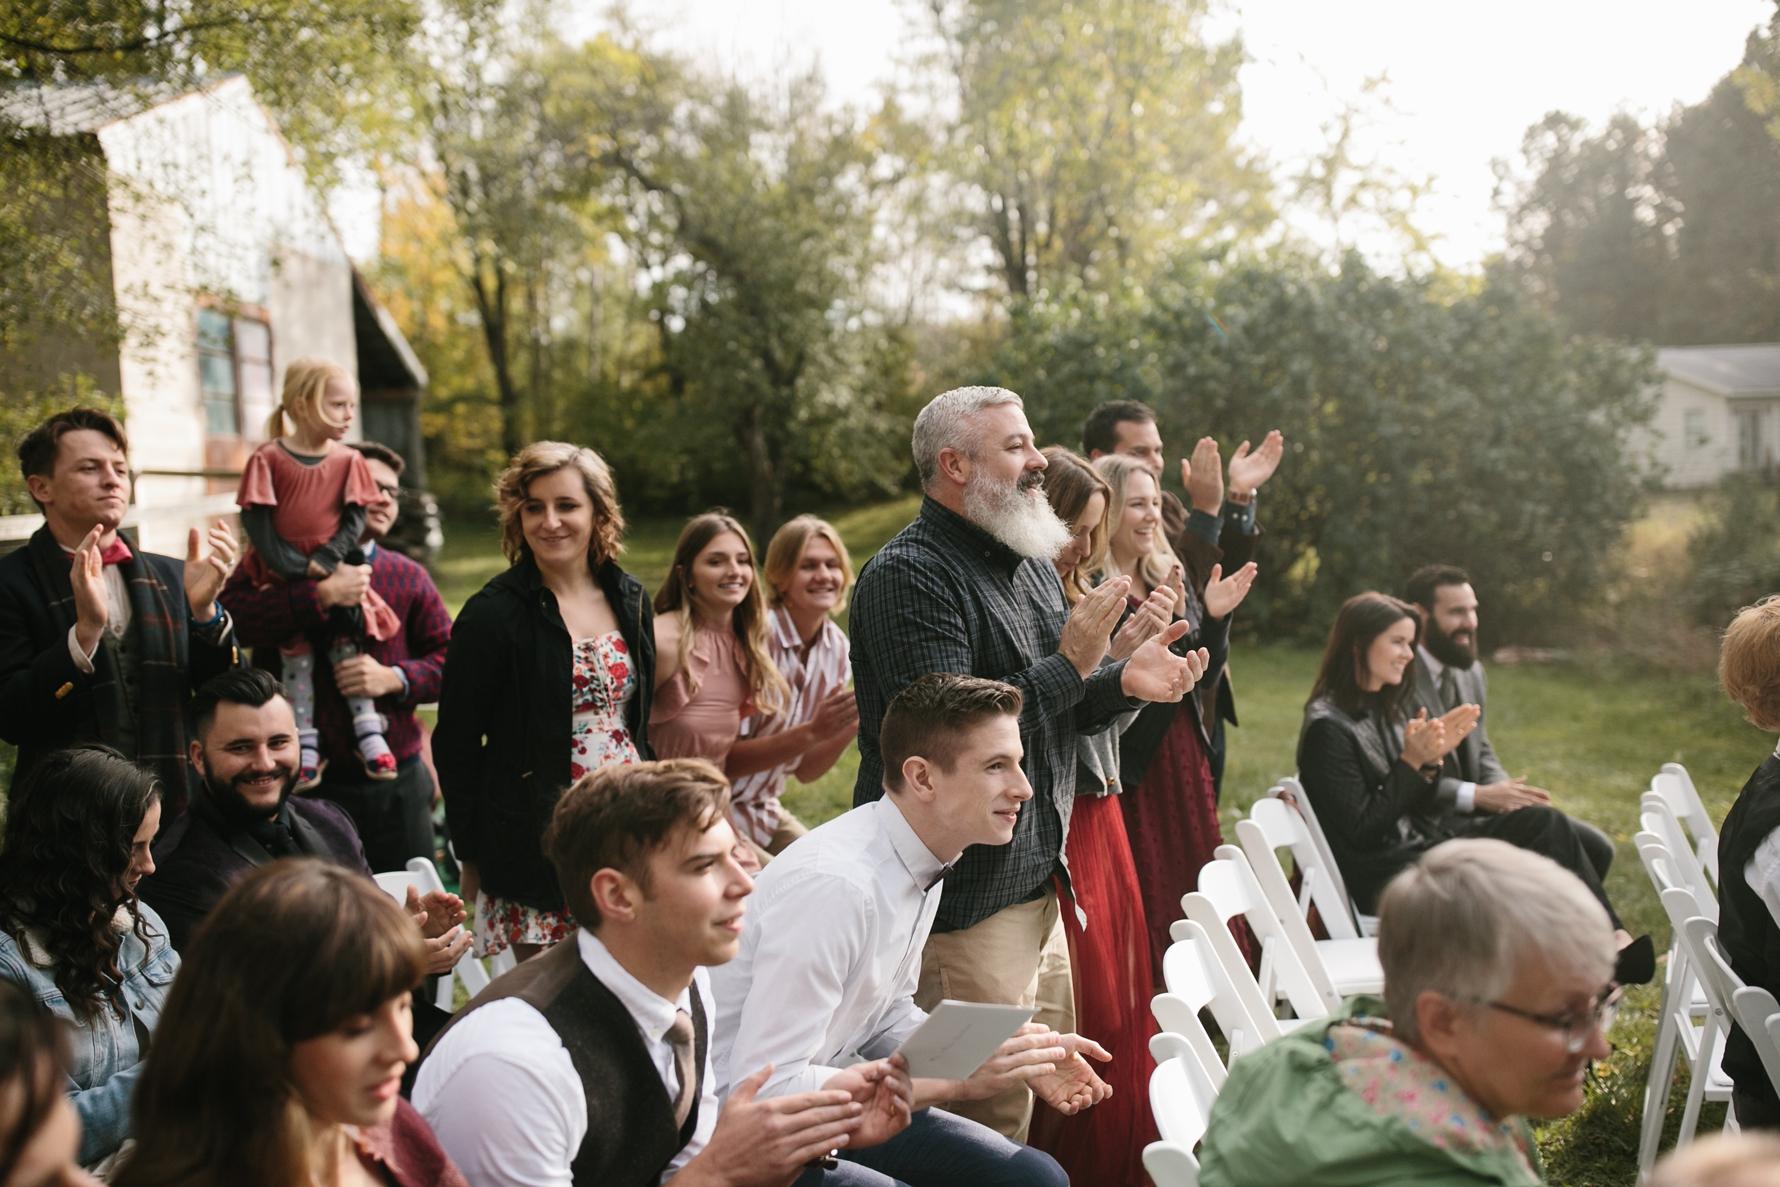 norris-traverse-city-wedding-49.JPG